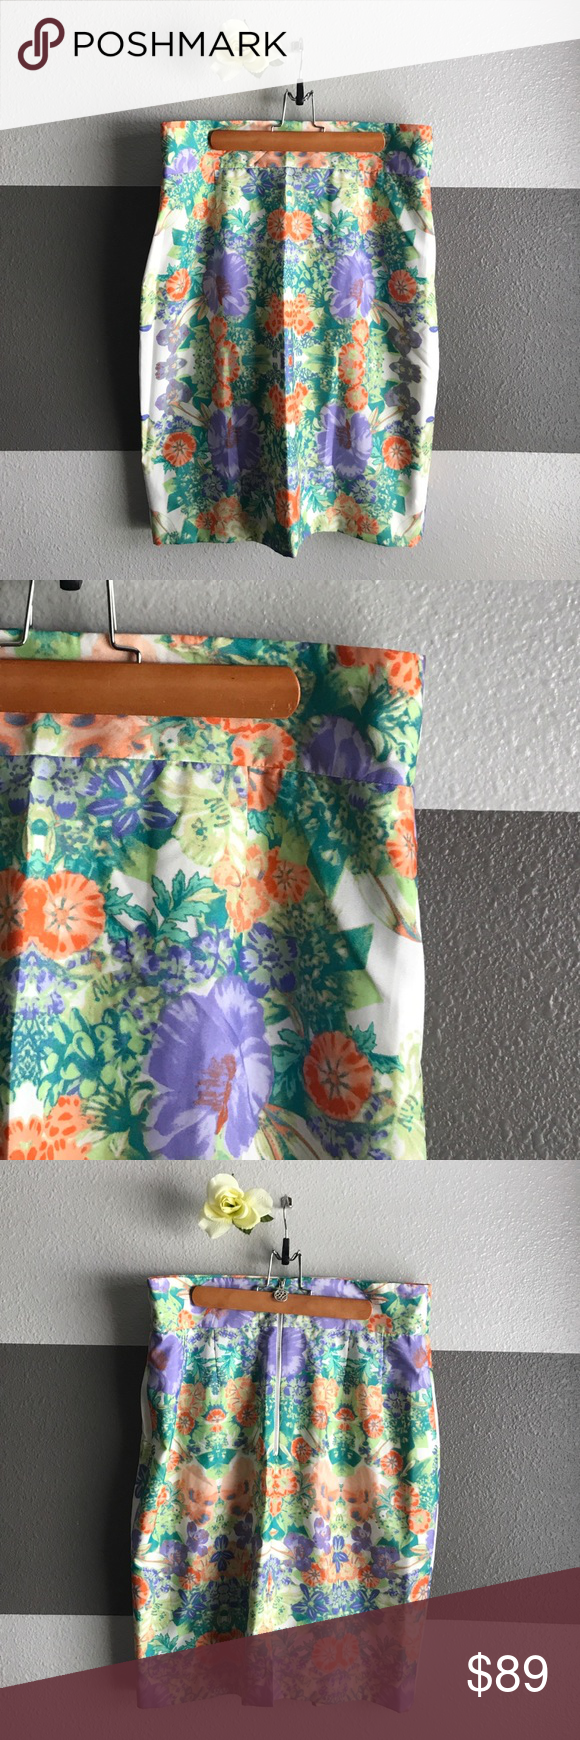 "Antonio Melani Bertie Skirt Antonio Melani | Size: 12 | ""Spring Breeze"" Design with beautiful multicolored floral print | NWT ANTONIO MELANI Skirts Midi"